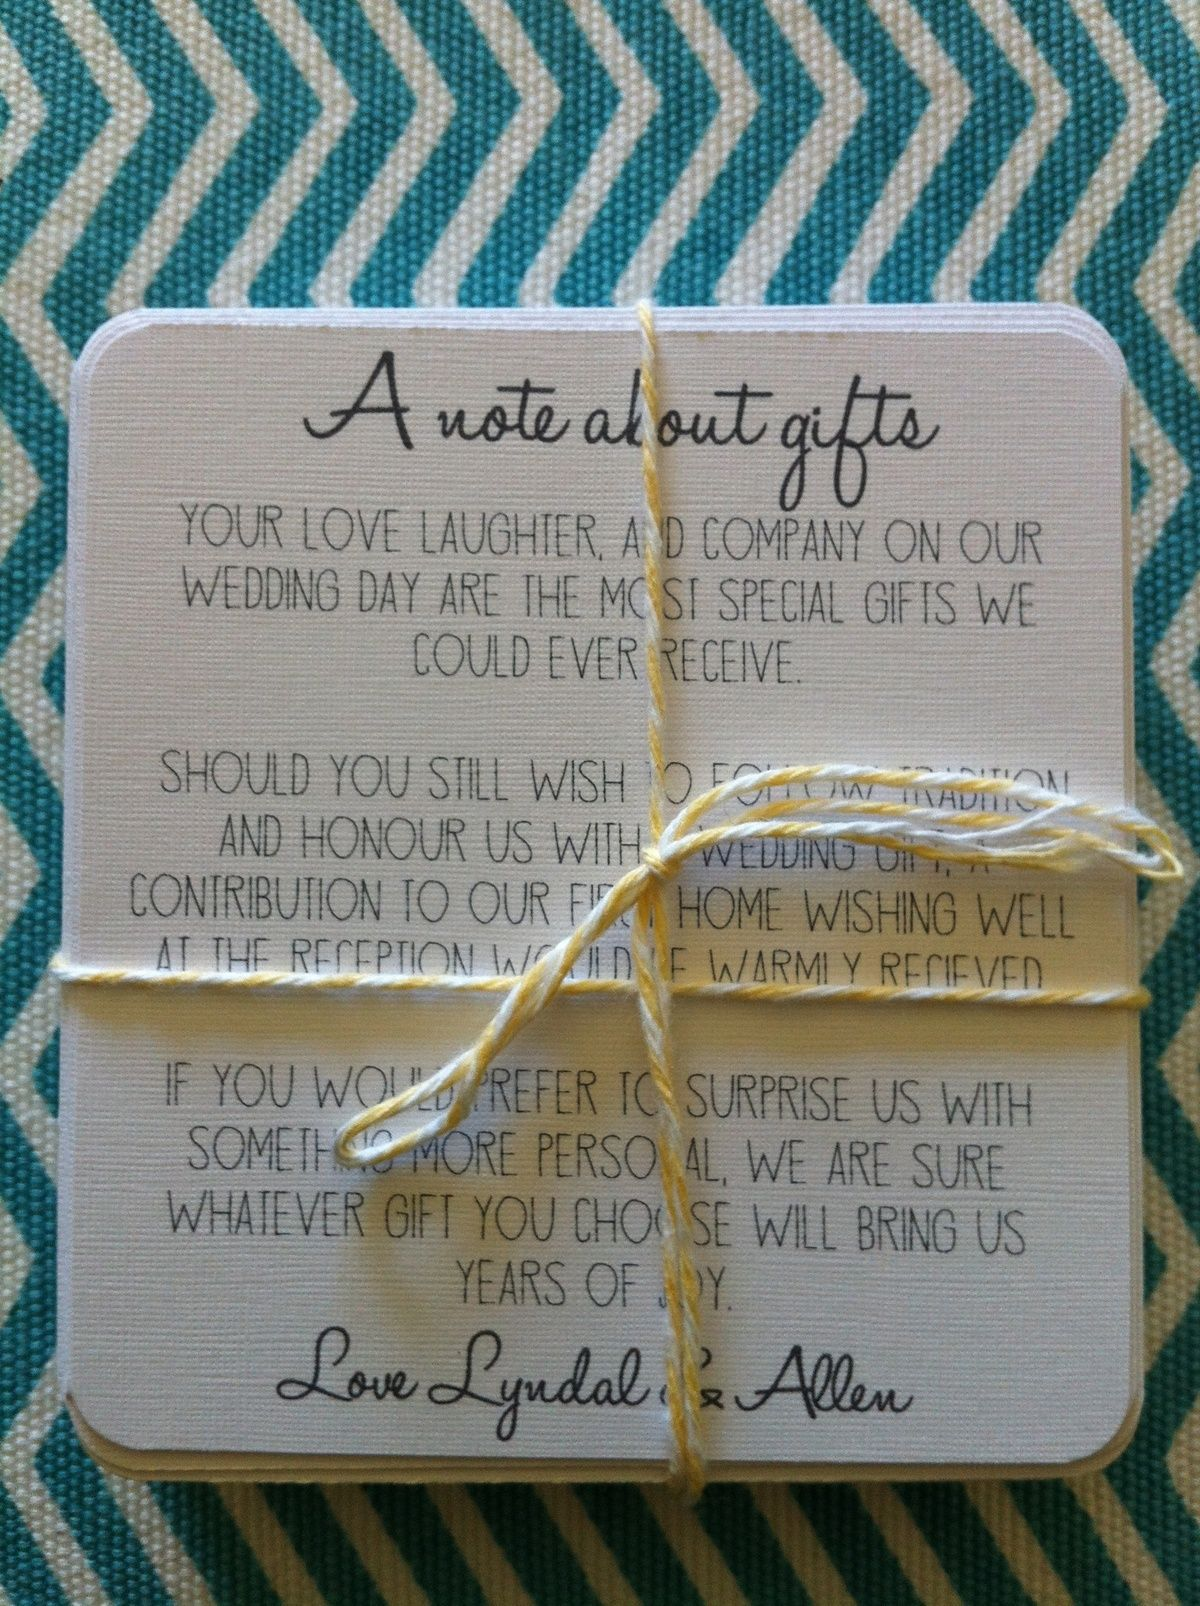 Monetary Gift Wedding Wording: Pin By Michelle Dunn On Wedding Stuff